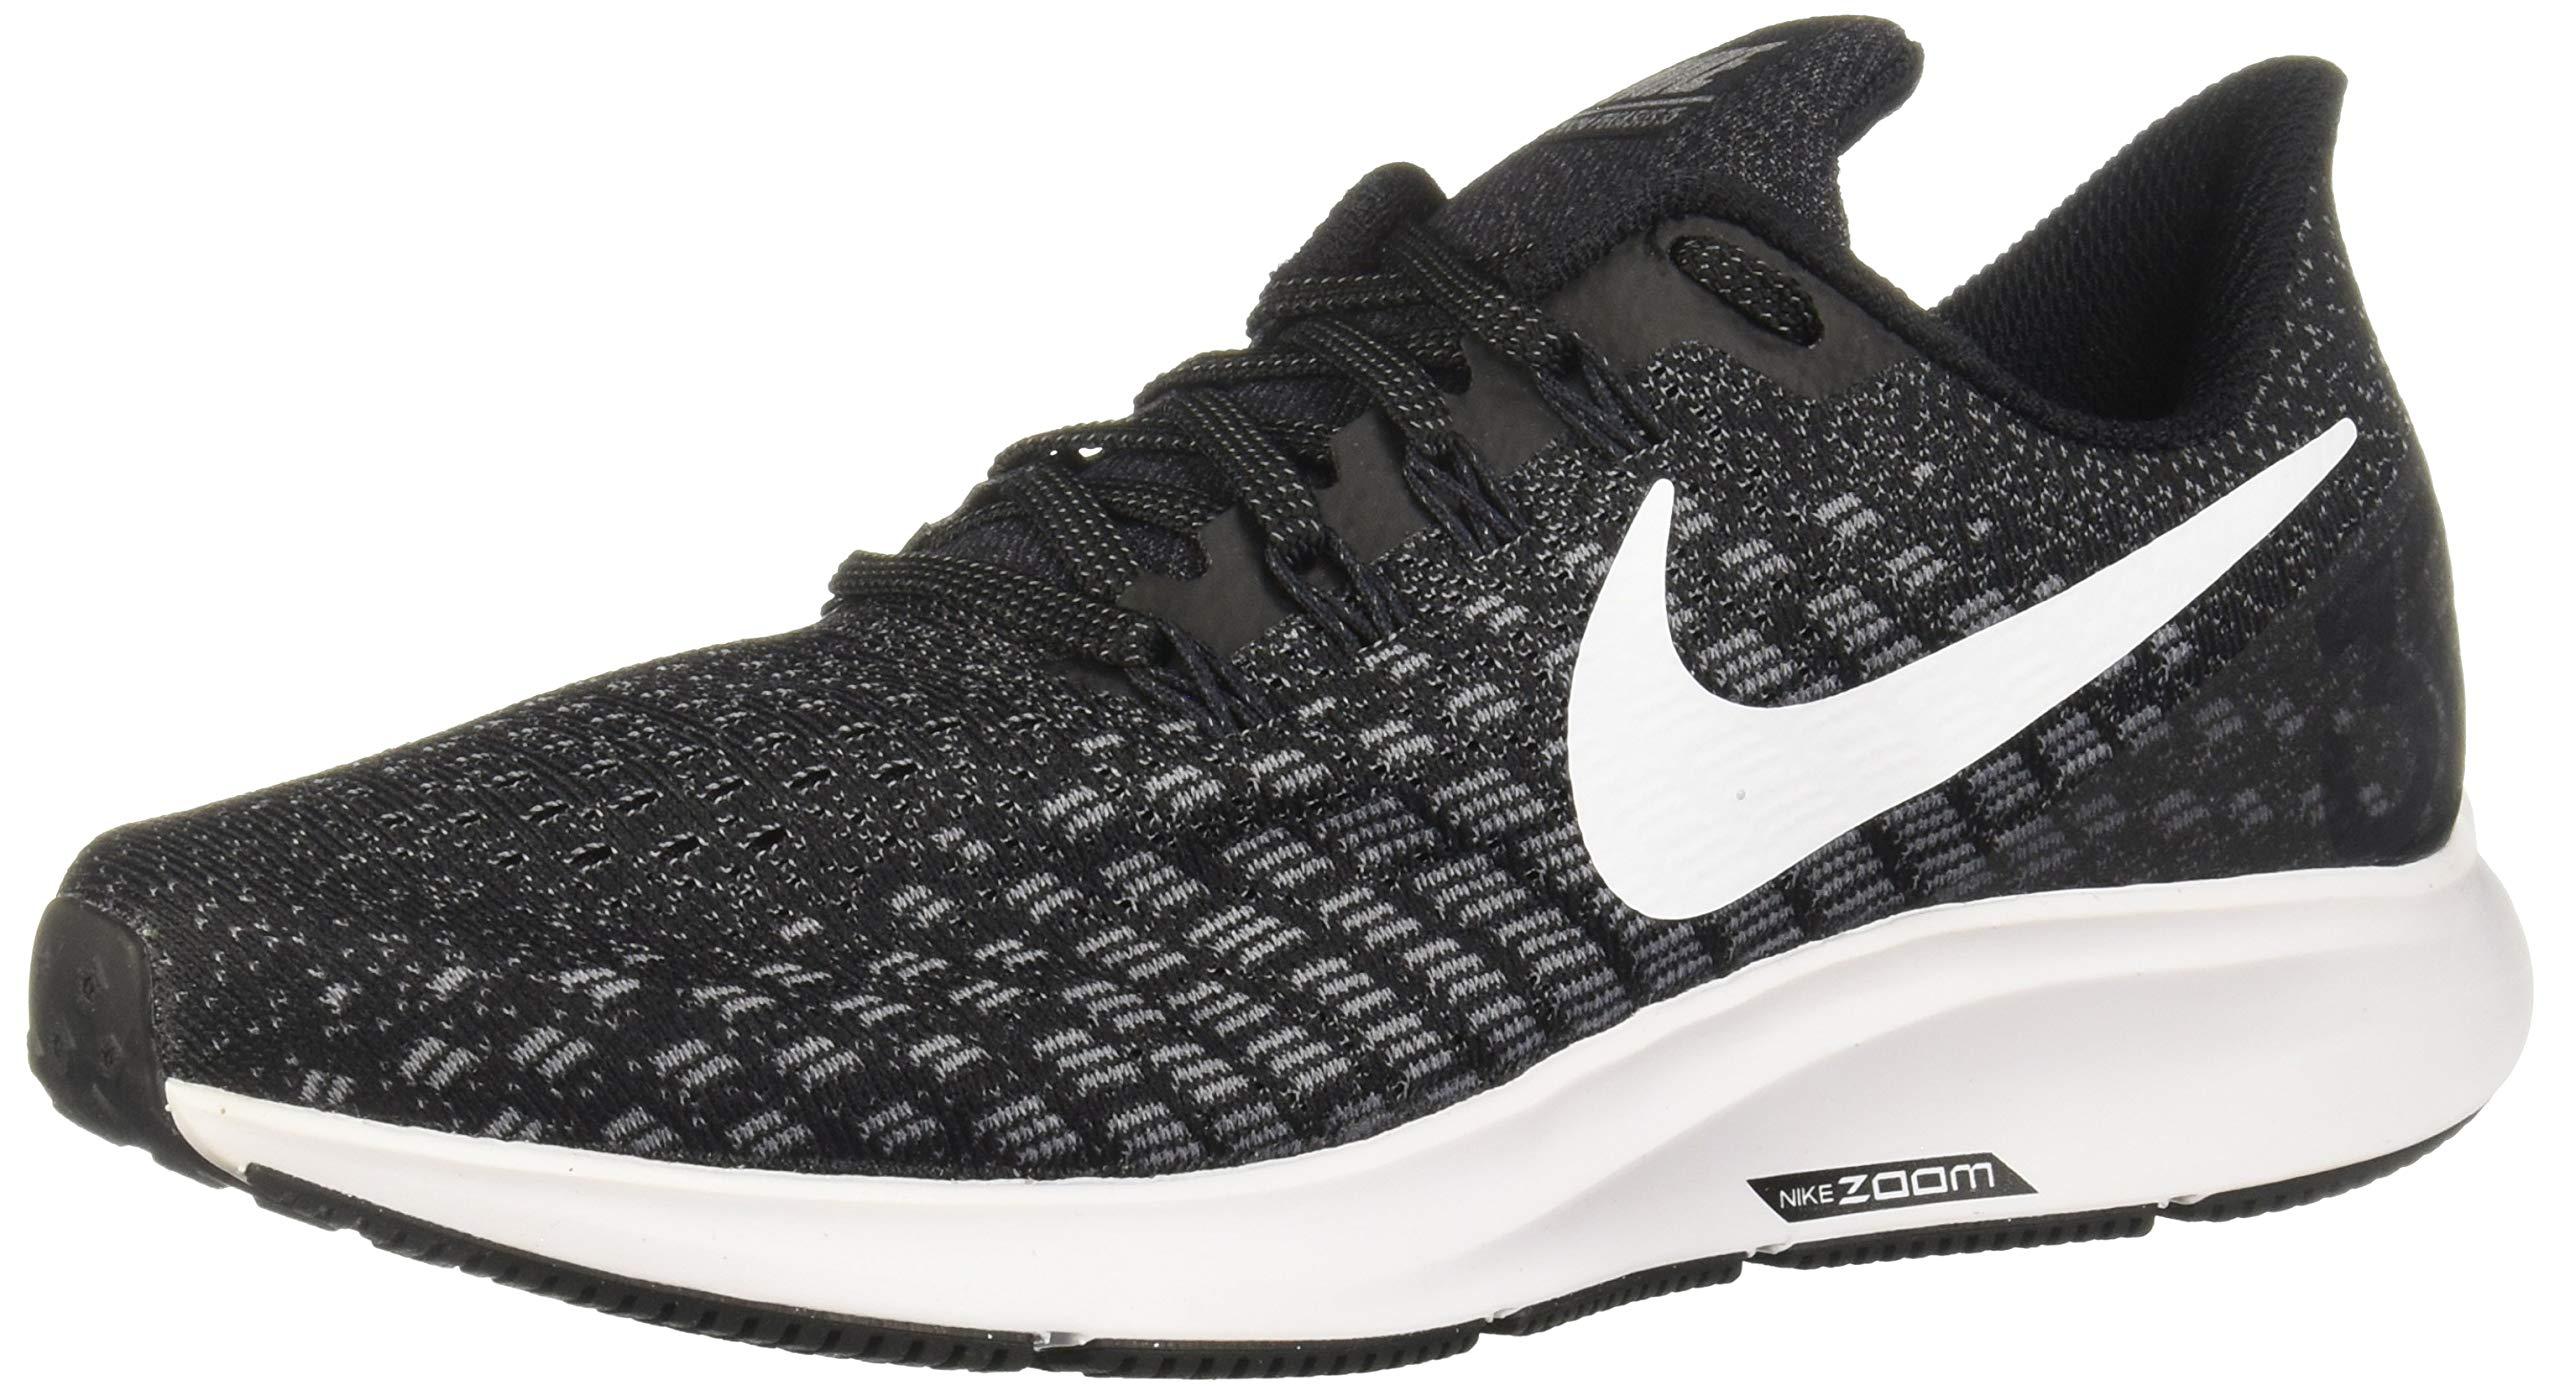 promo code 527ce fcb46 Galleon - Nike Shox Current Gs Women s Running Shoe (5, Black Black)